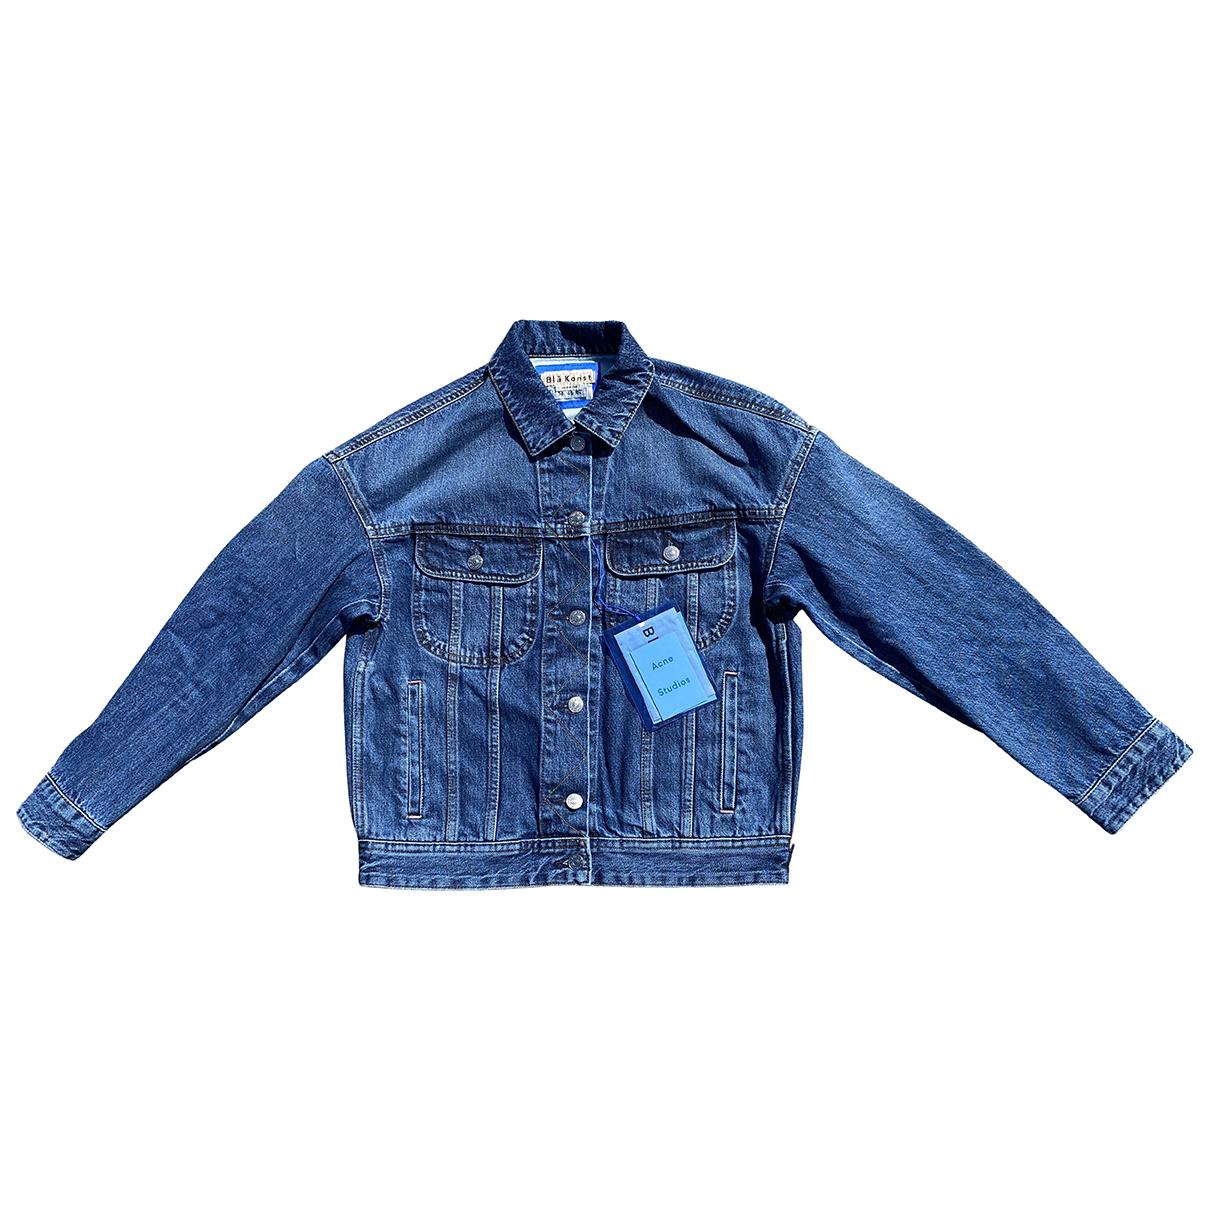 Acne Studios Blå Konst Blue Denim - Jeans jacket for Women 34 FR